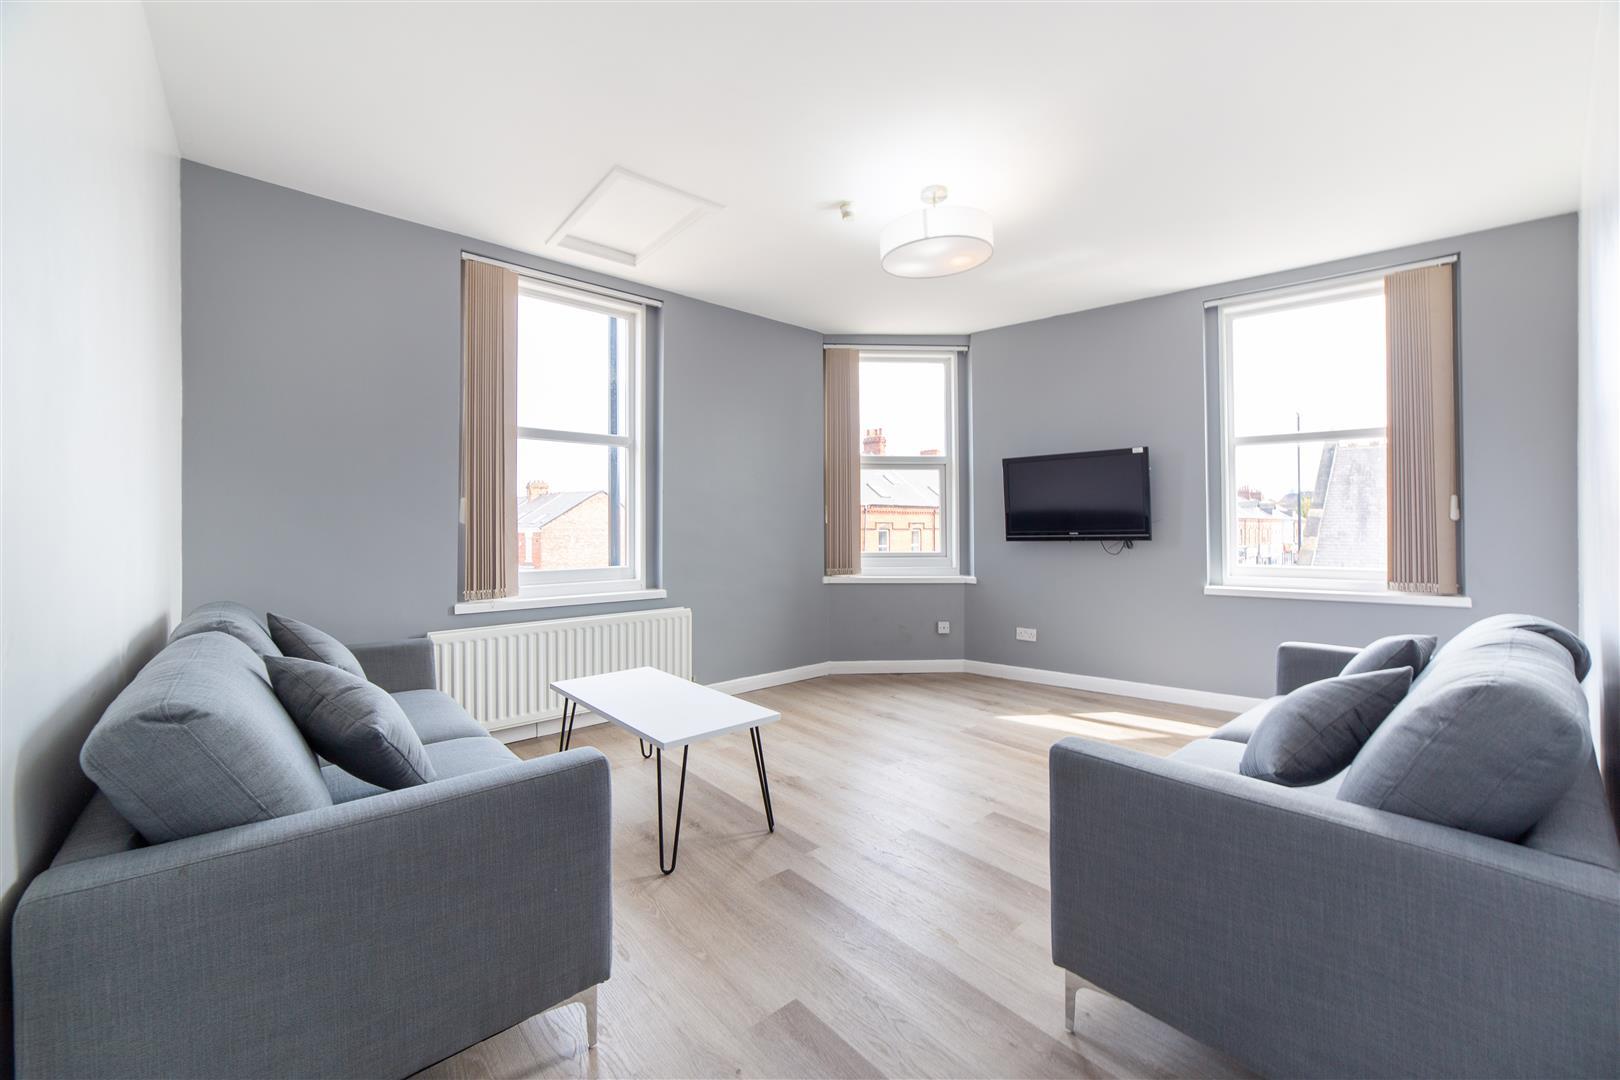 6 bed apartment to rent in Heaton Road, Heaton, NE6